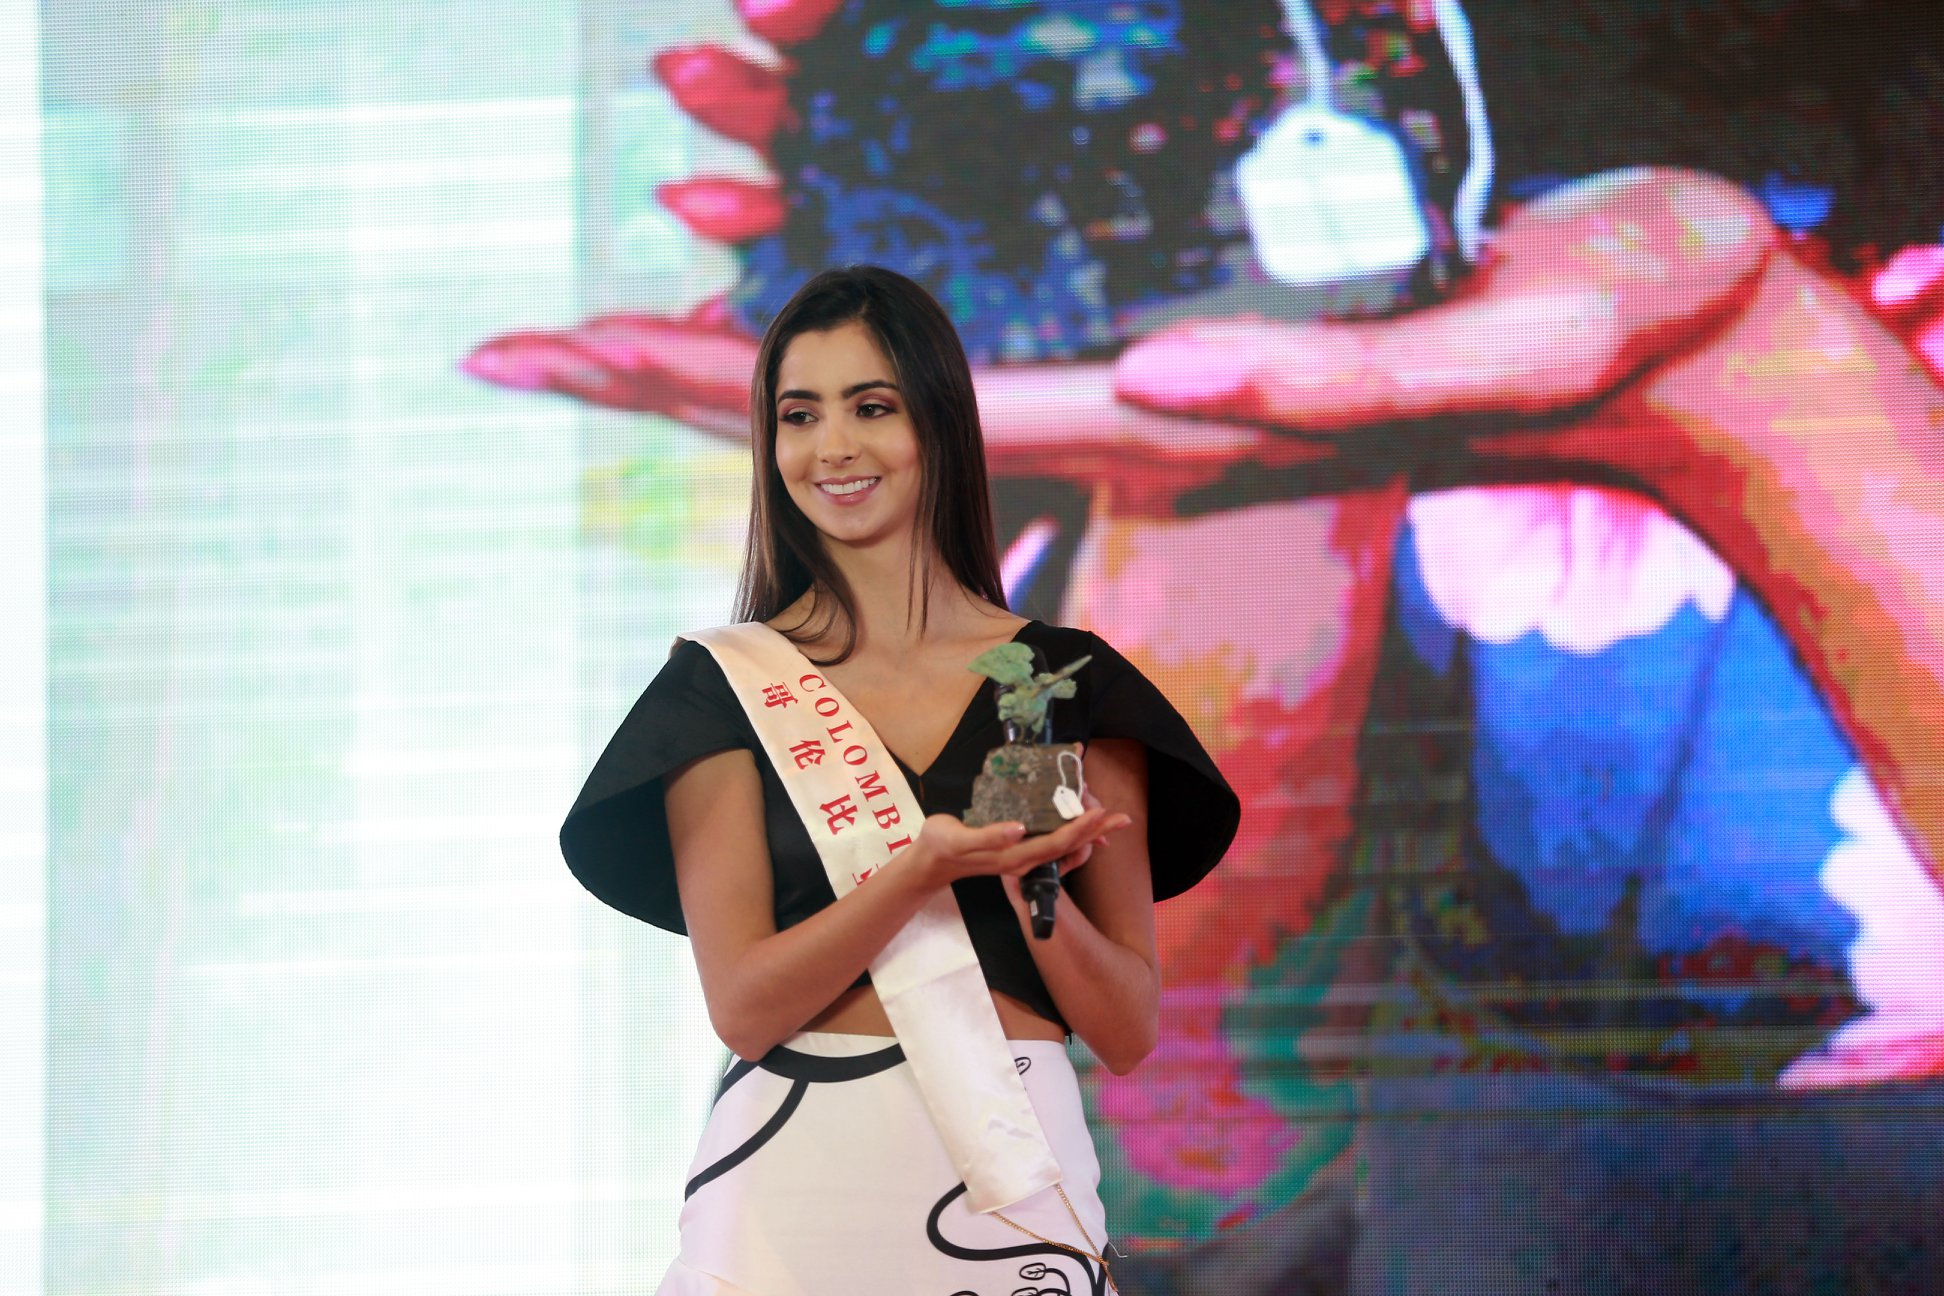 laura osorio hoyos, miss colombia mundo 2018. - Página 7 V3dre210